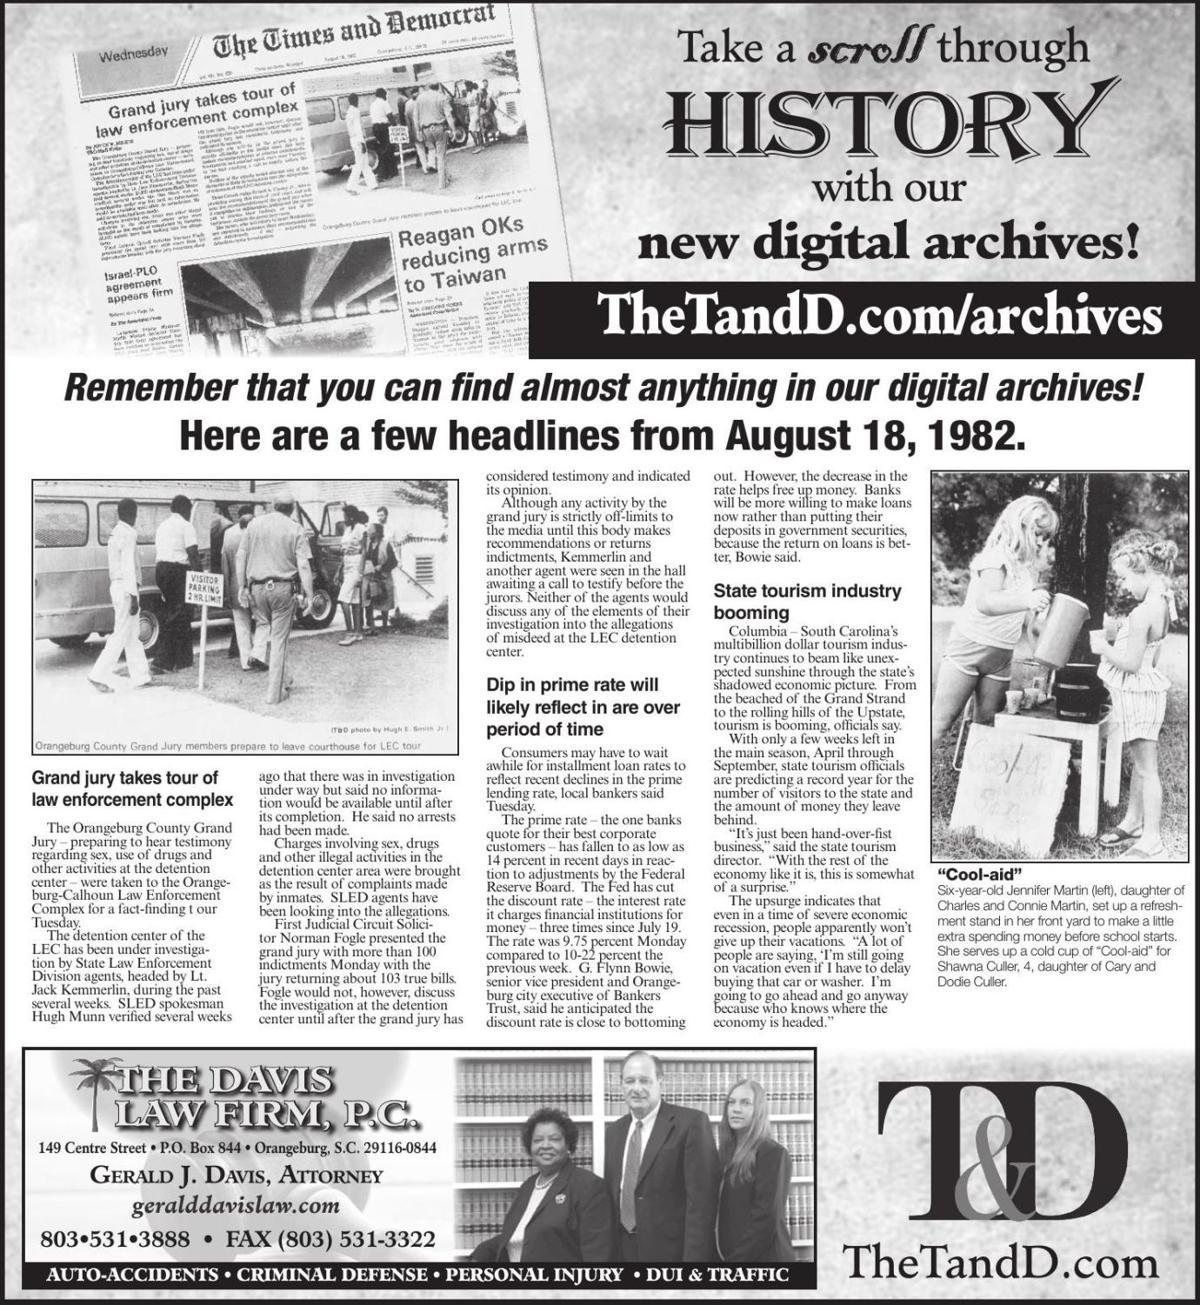 TheTandD.com/archives Aug. 18, 2019